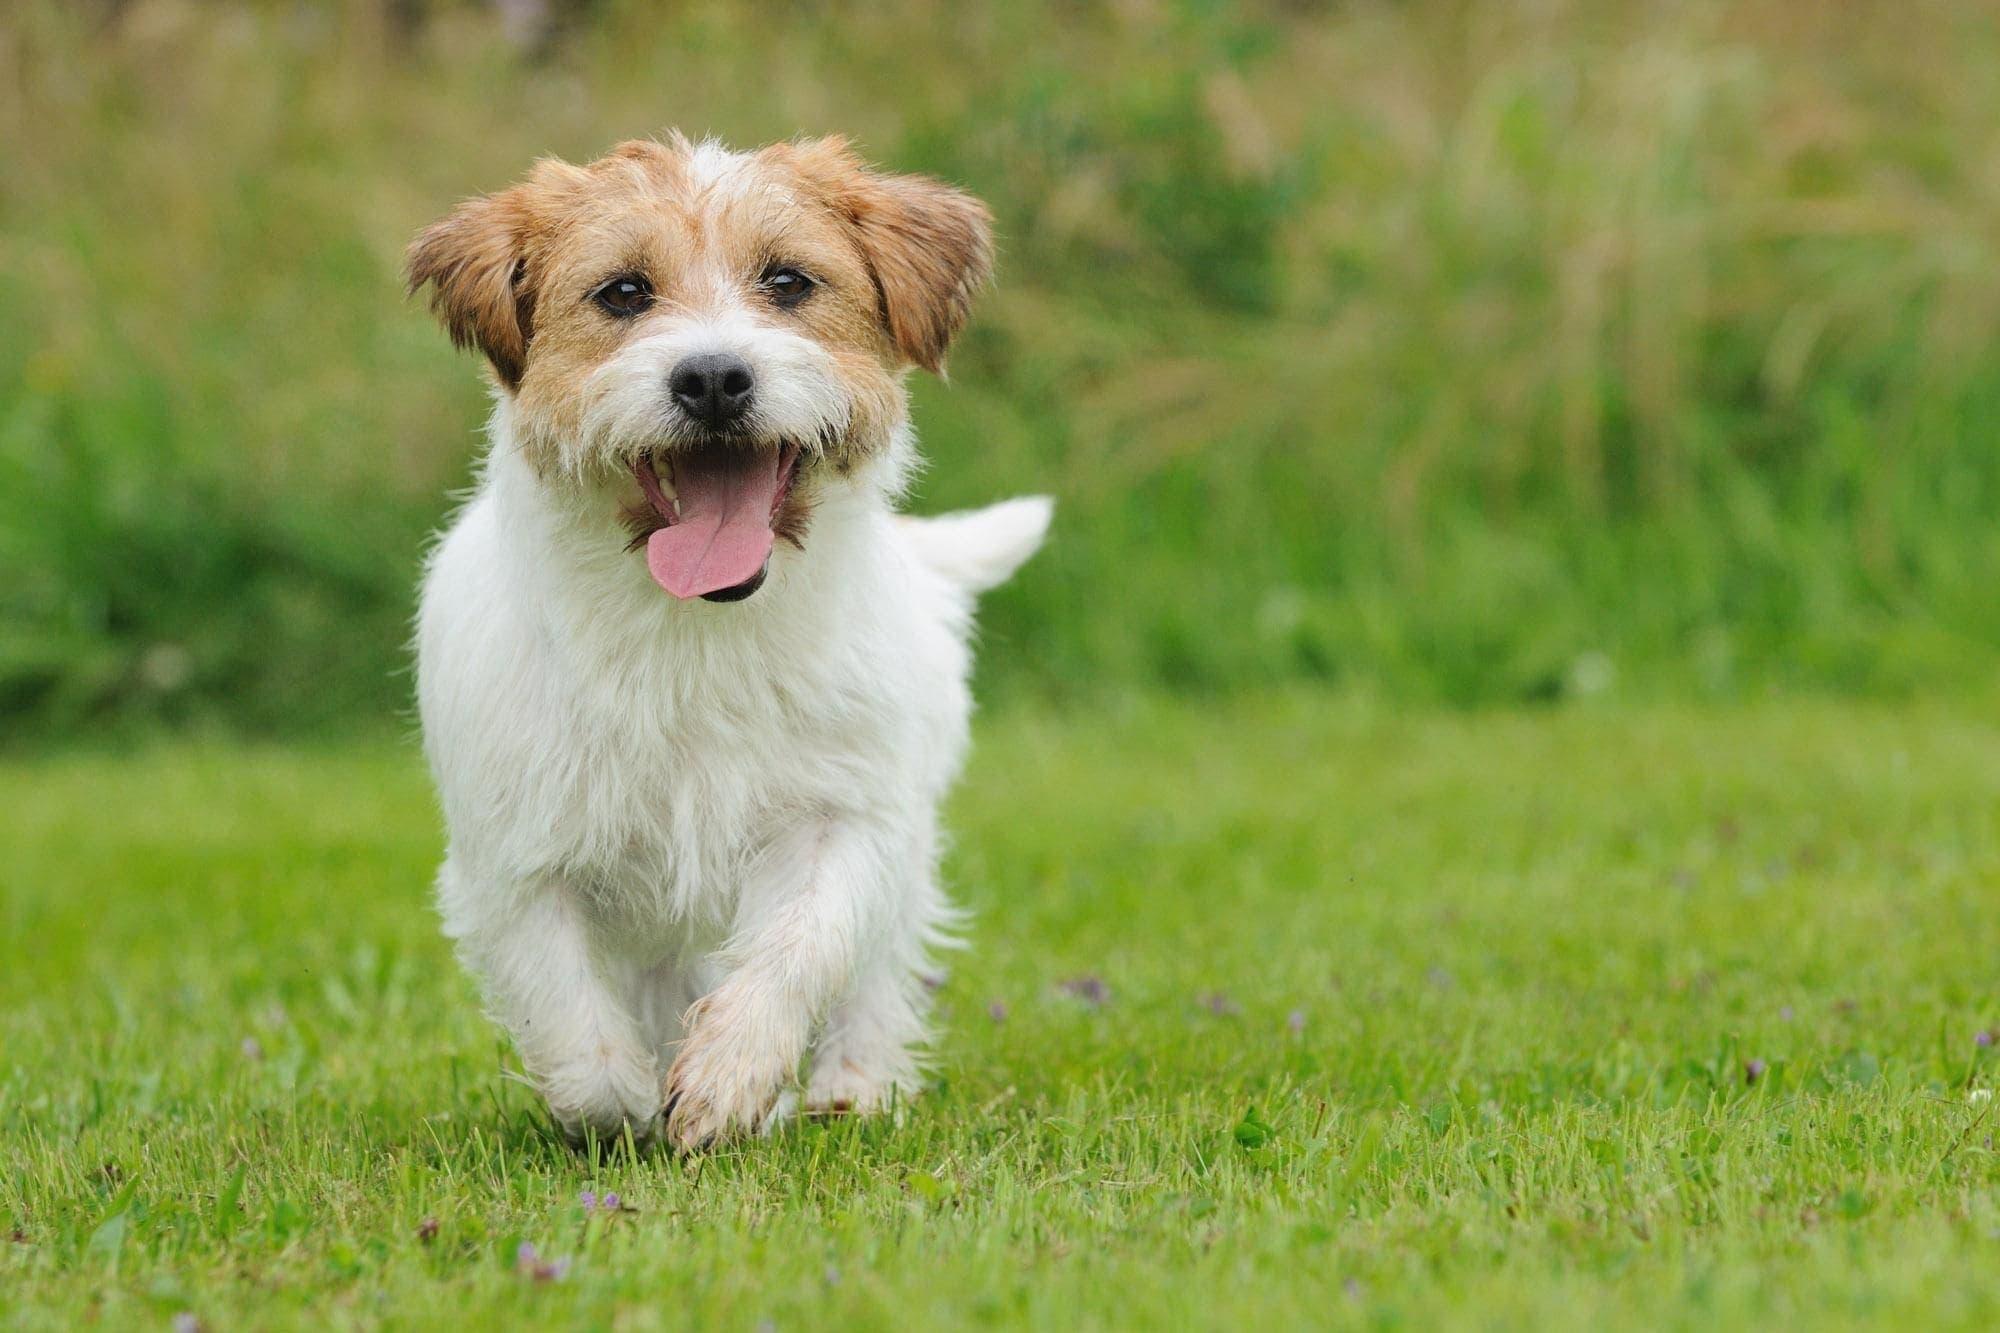 dog dream meaning, dream about dog, dog dream interpretation, seeing in a dream dog